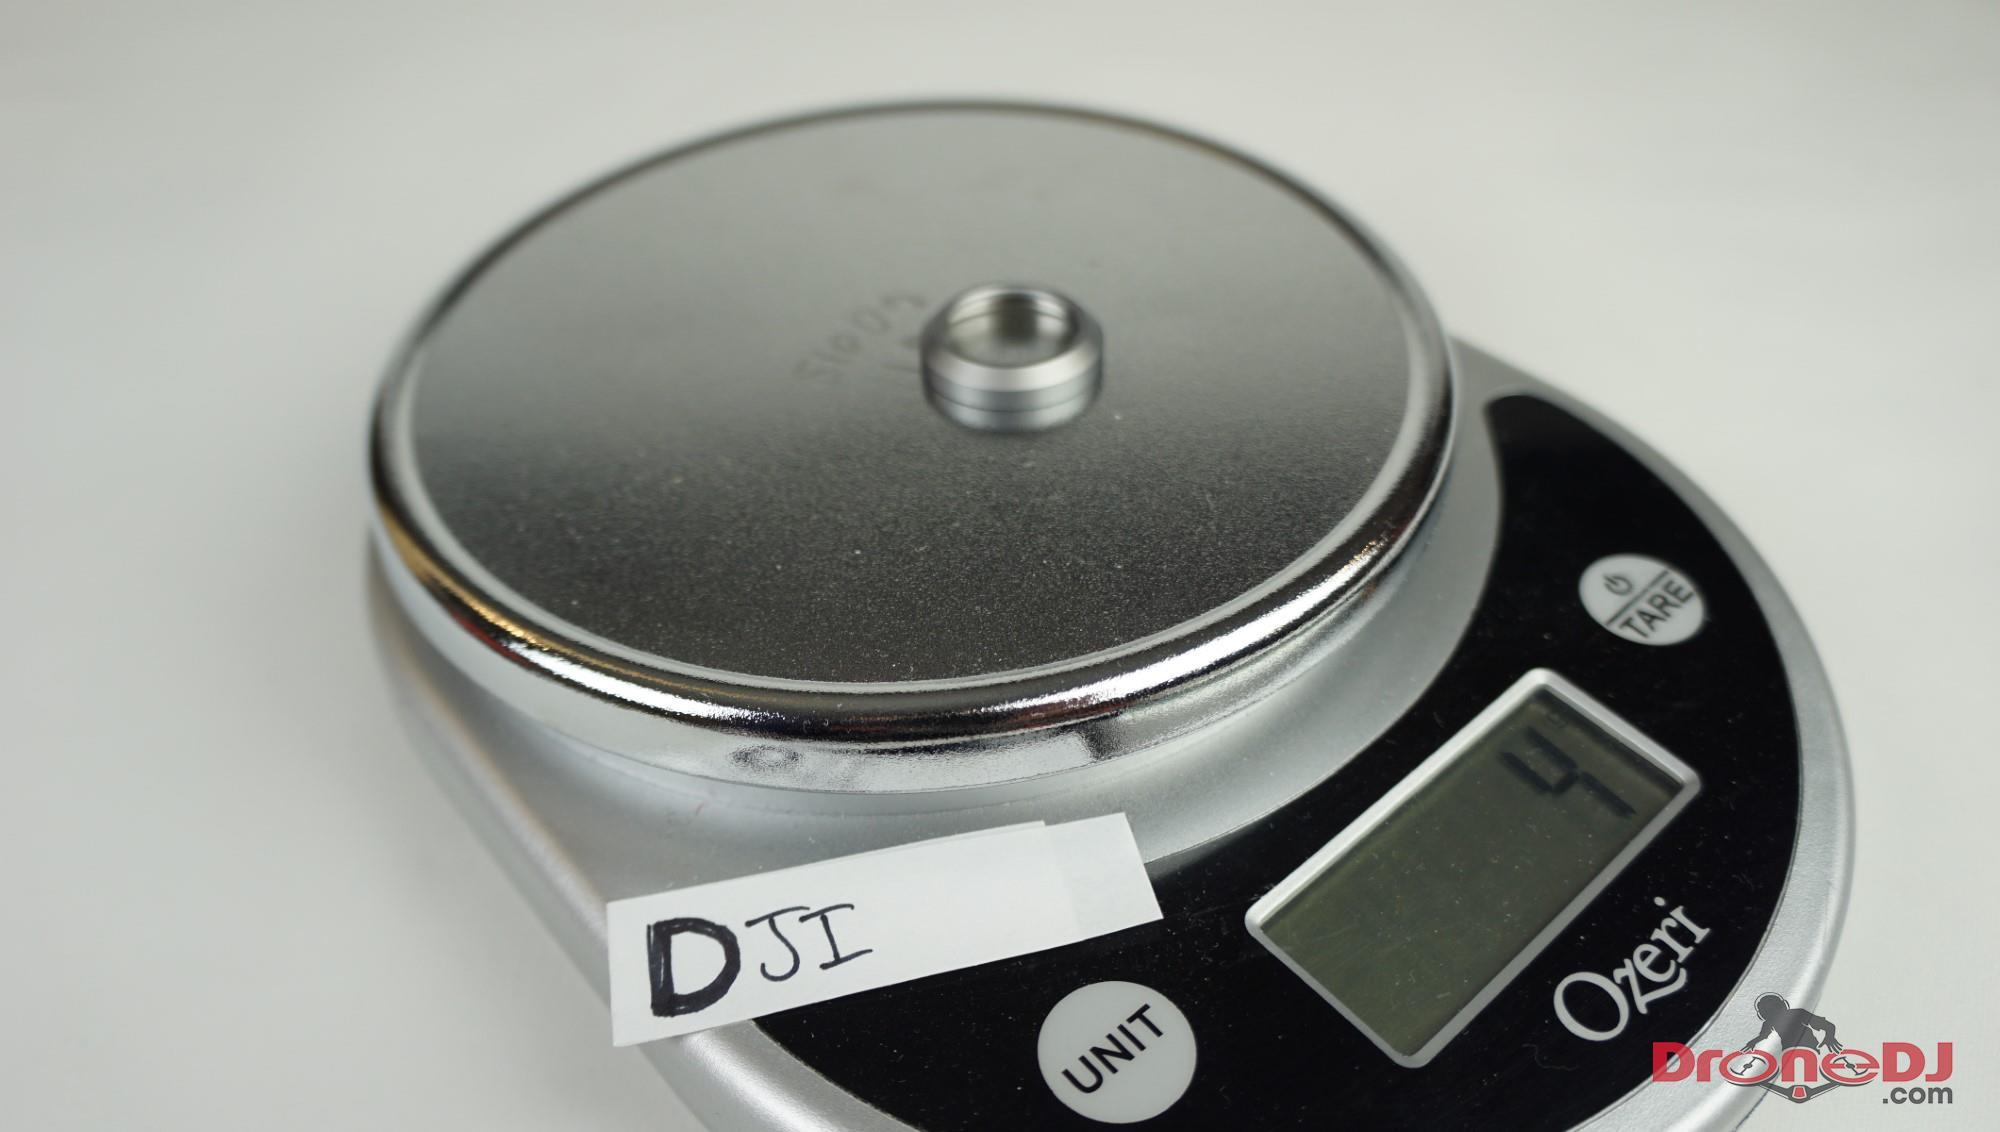 mavic 2 filter weight